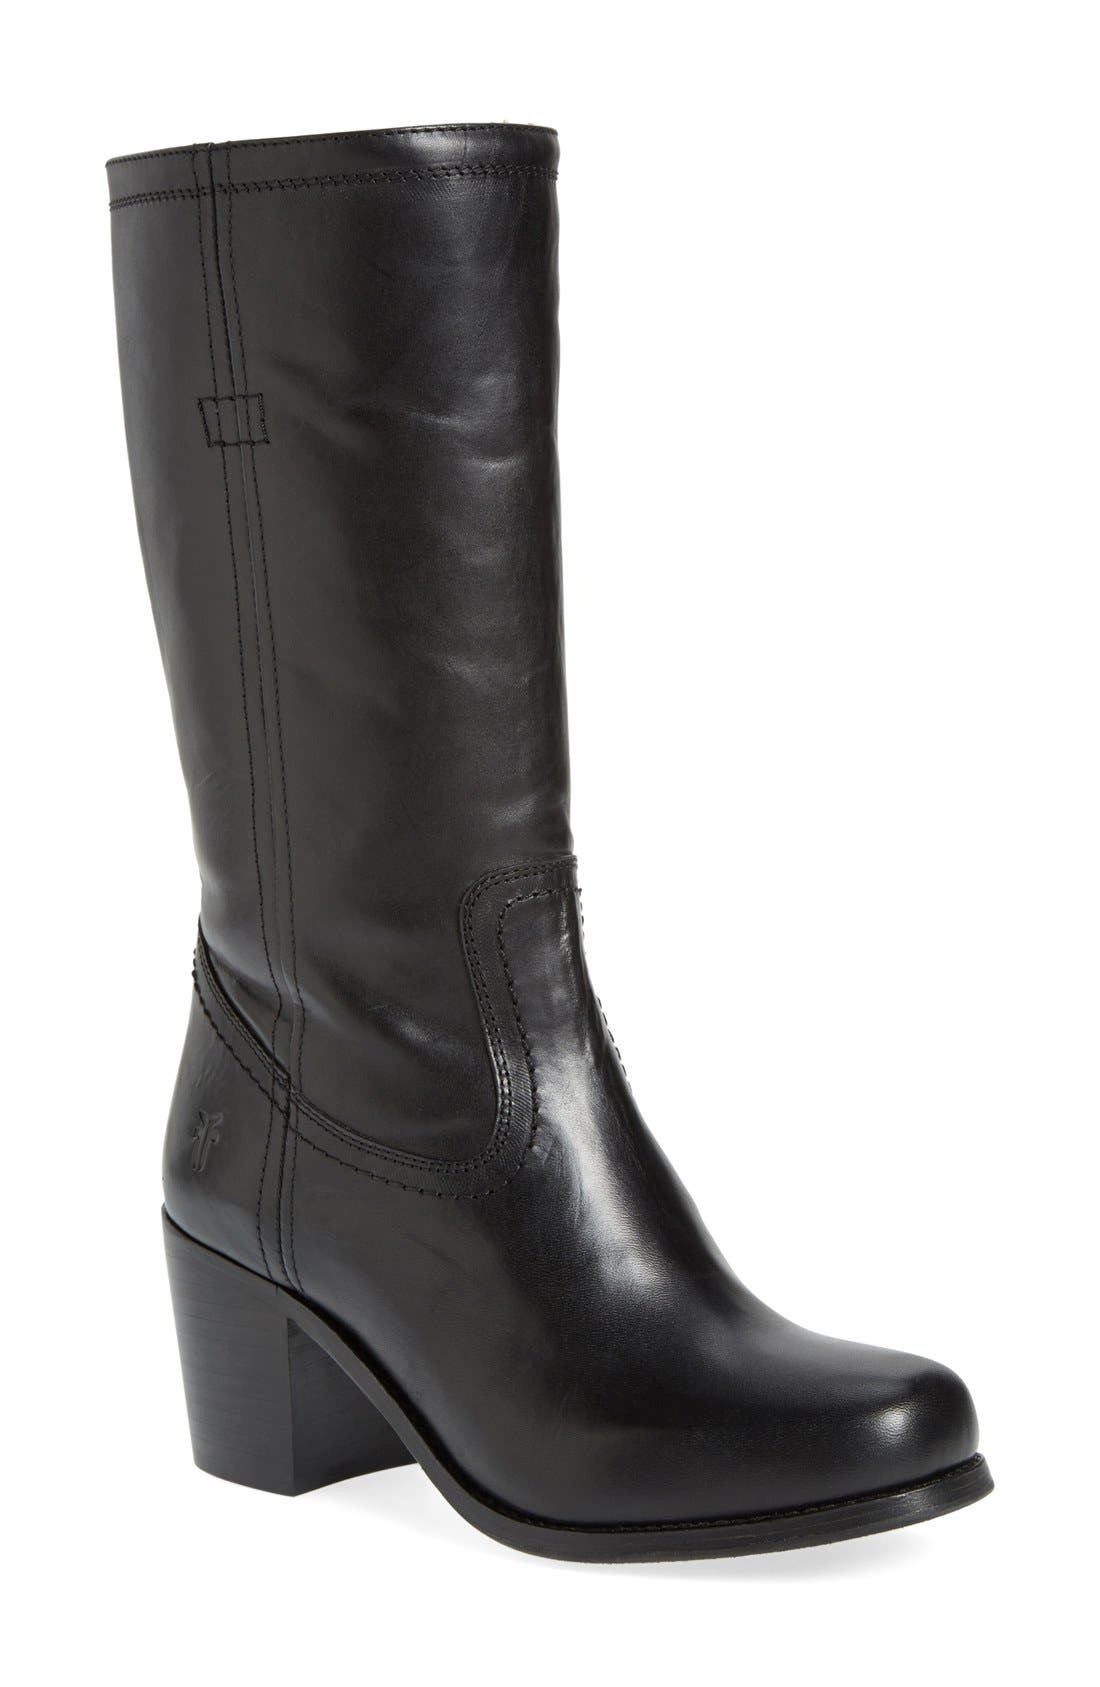 FRYE,                             'Kendall' Boot,                             Main thumbnail 1, color,                             001